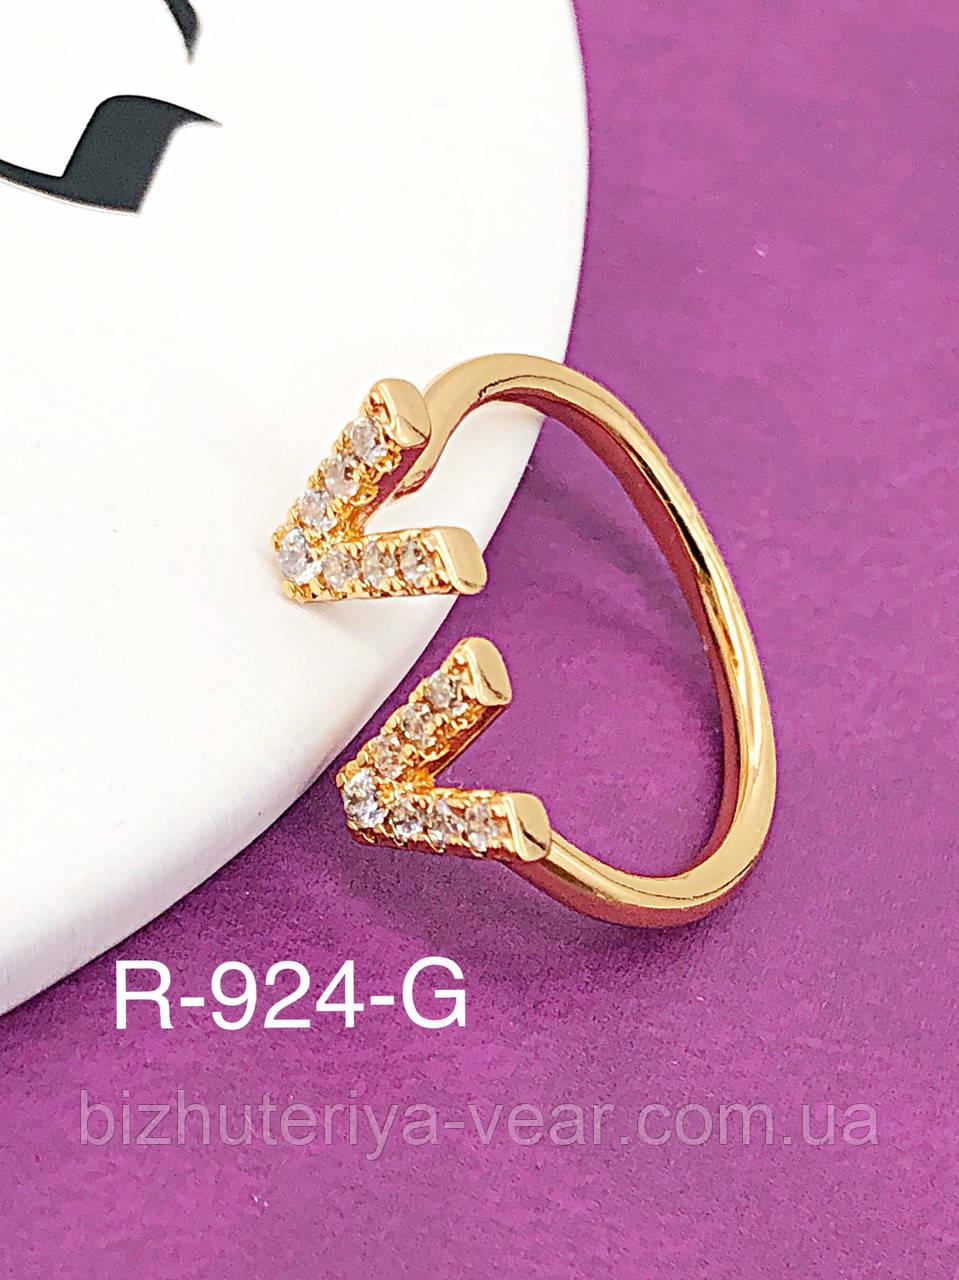 Кольцо R-924 б.размера